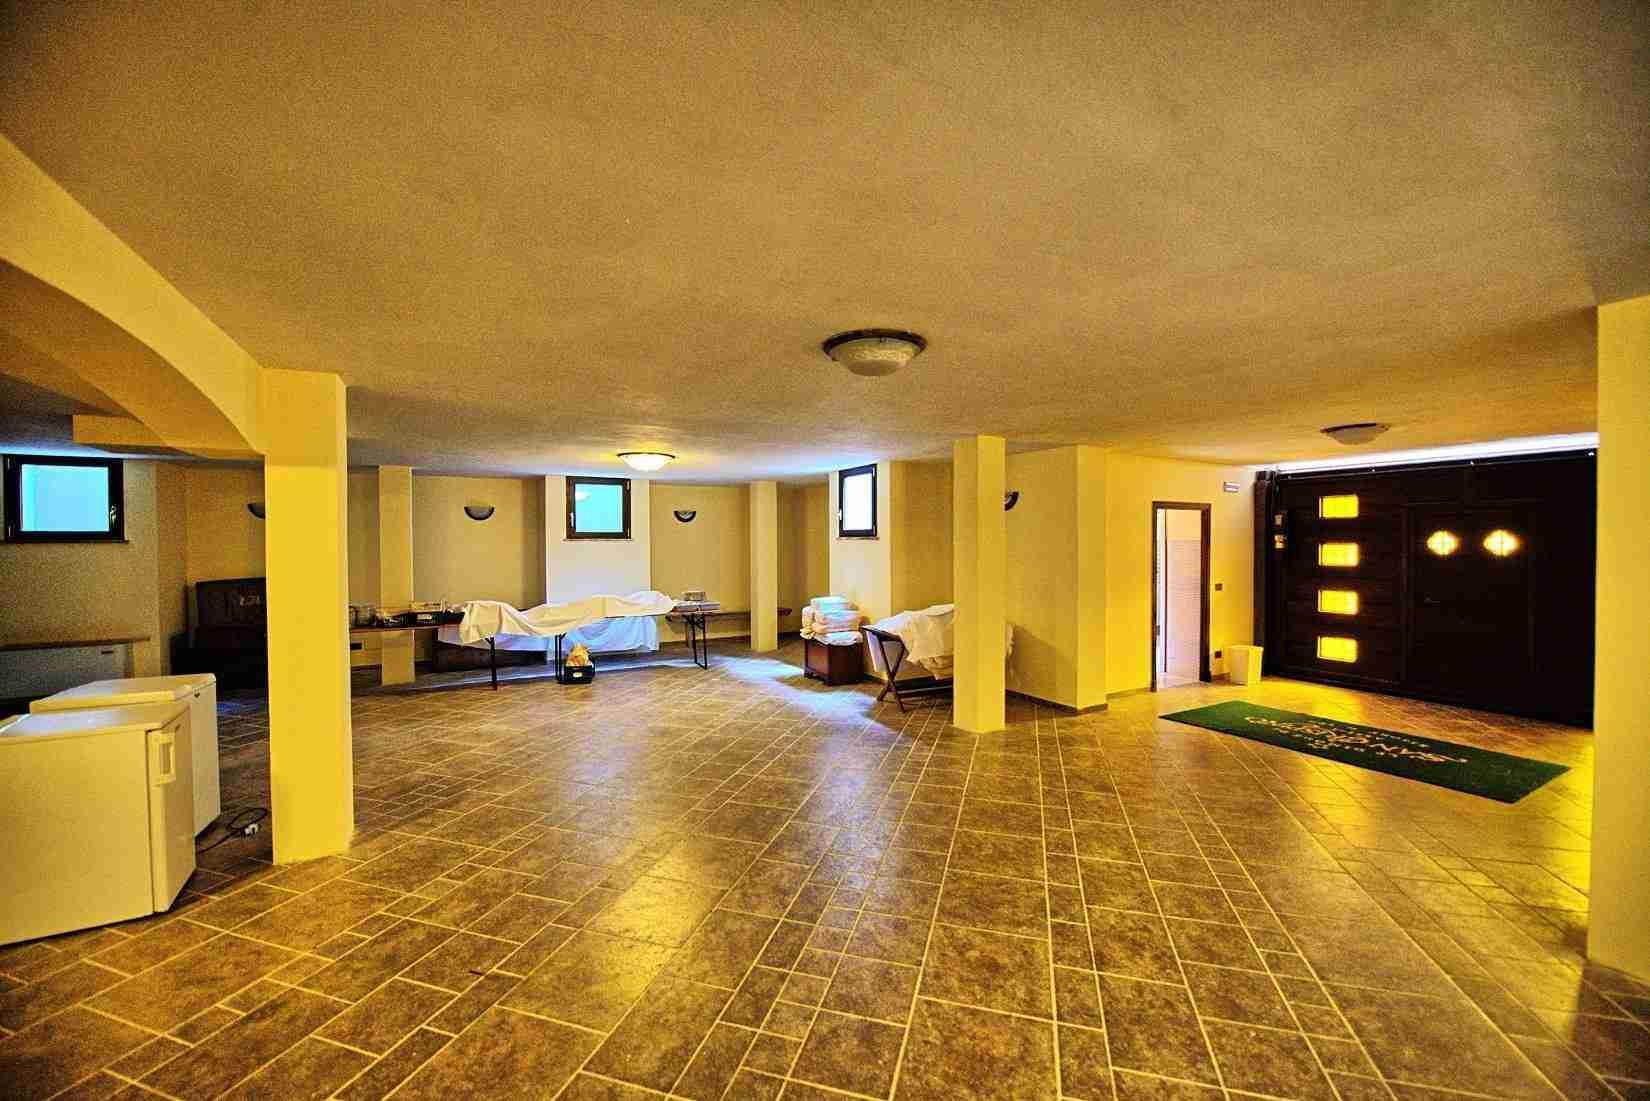 46 Assisi garage